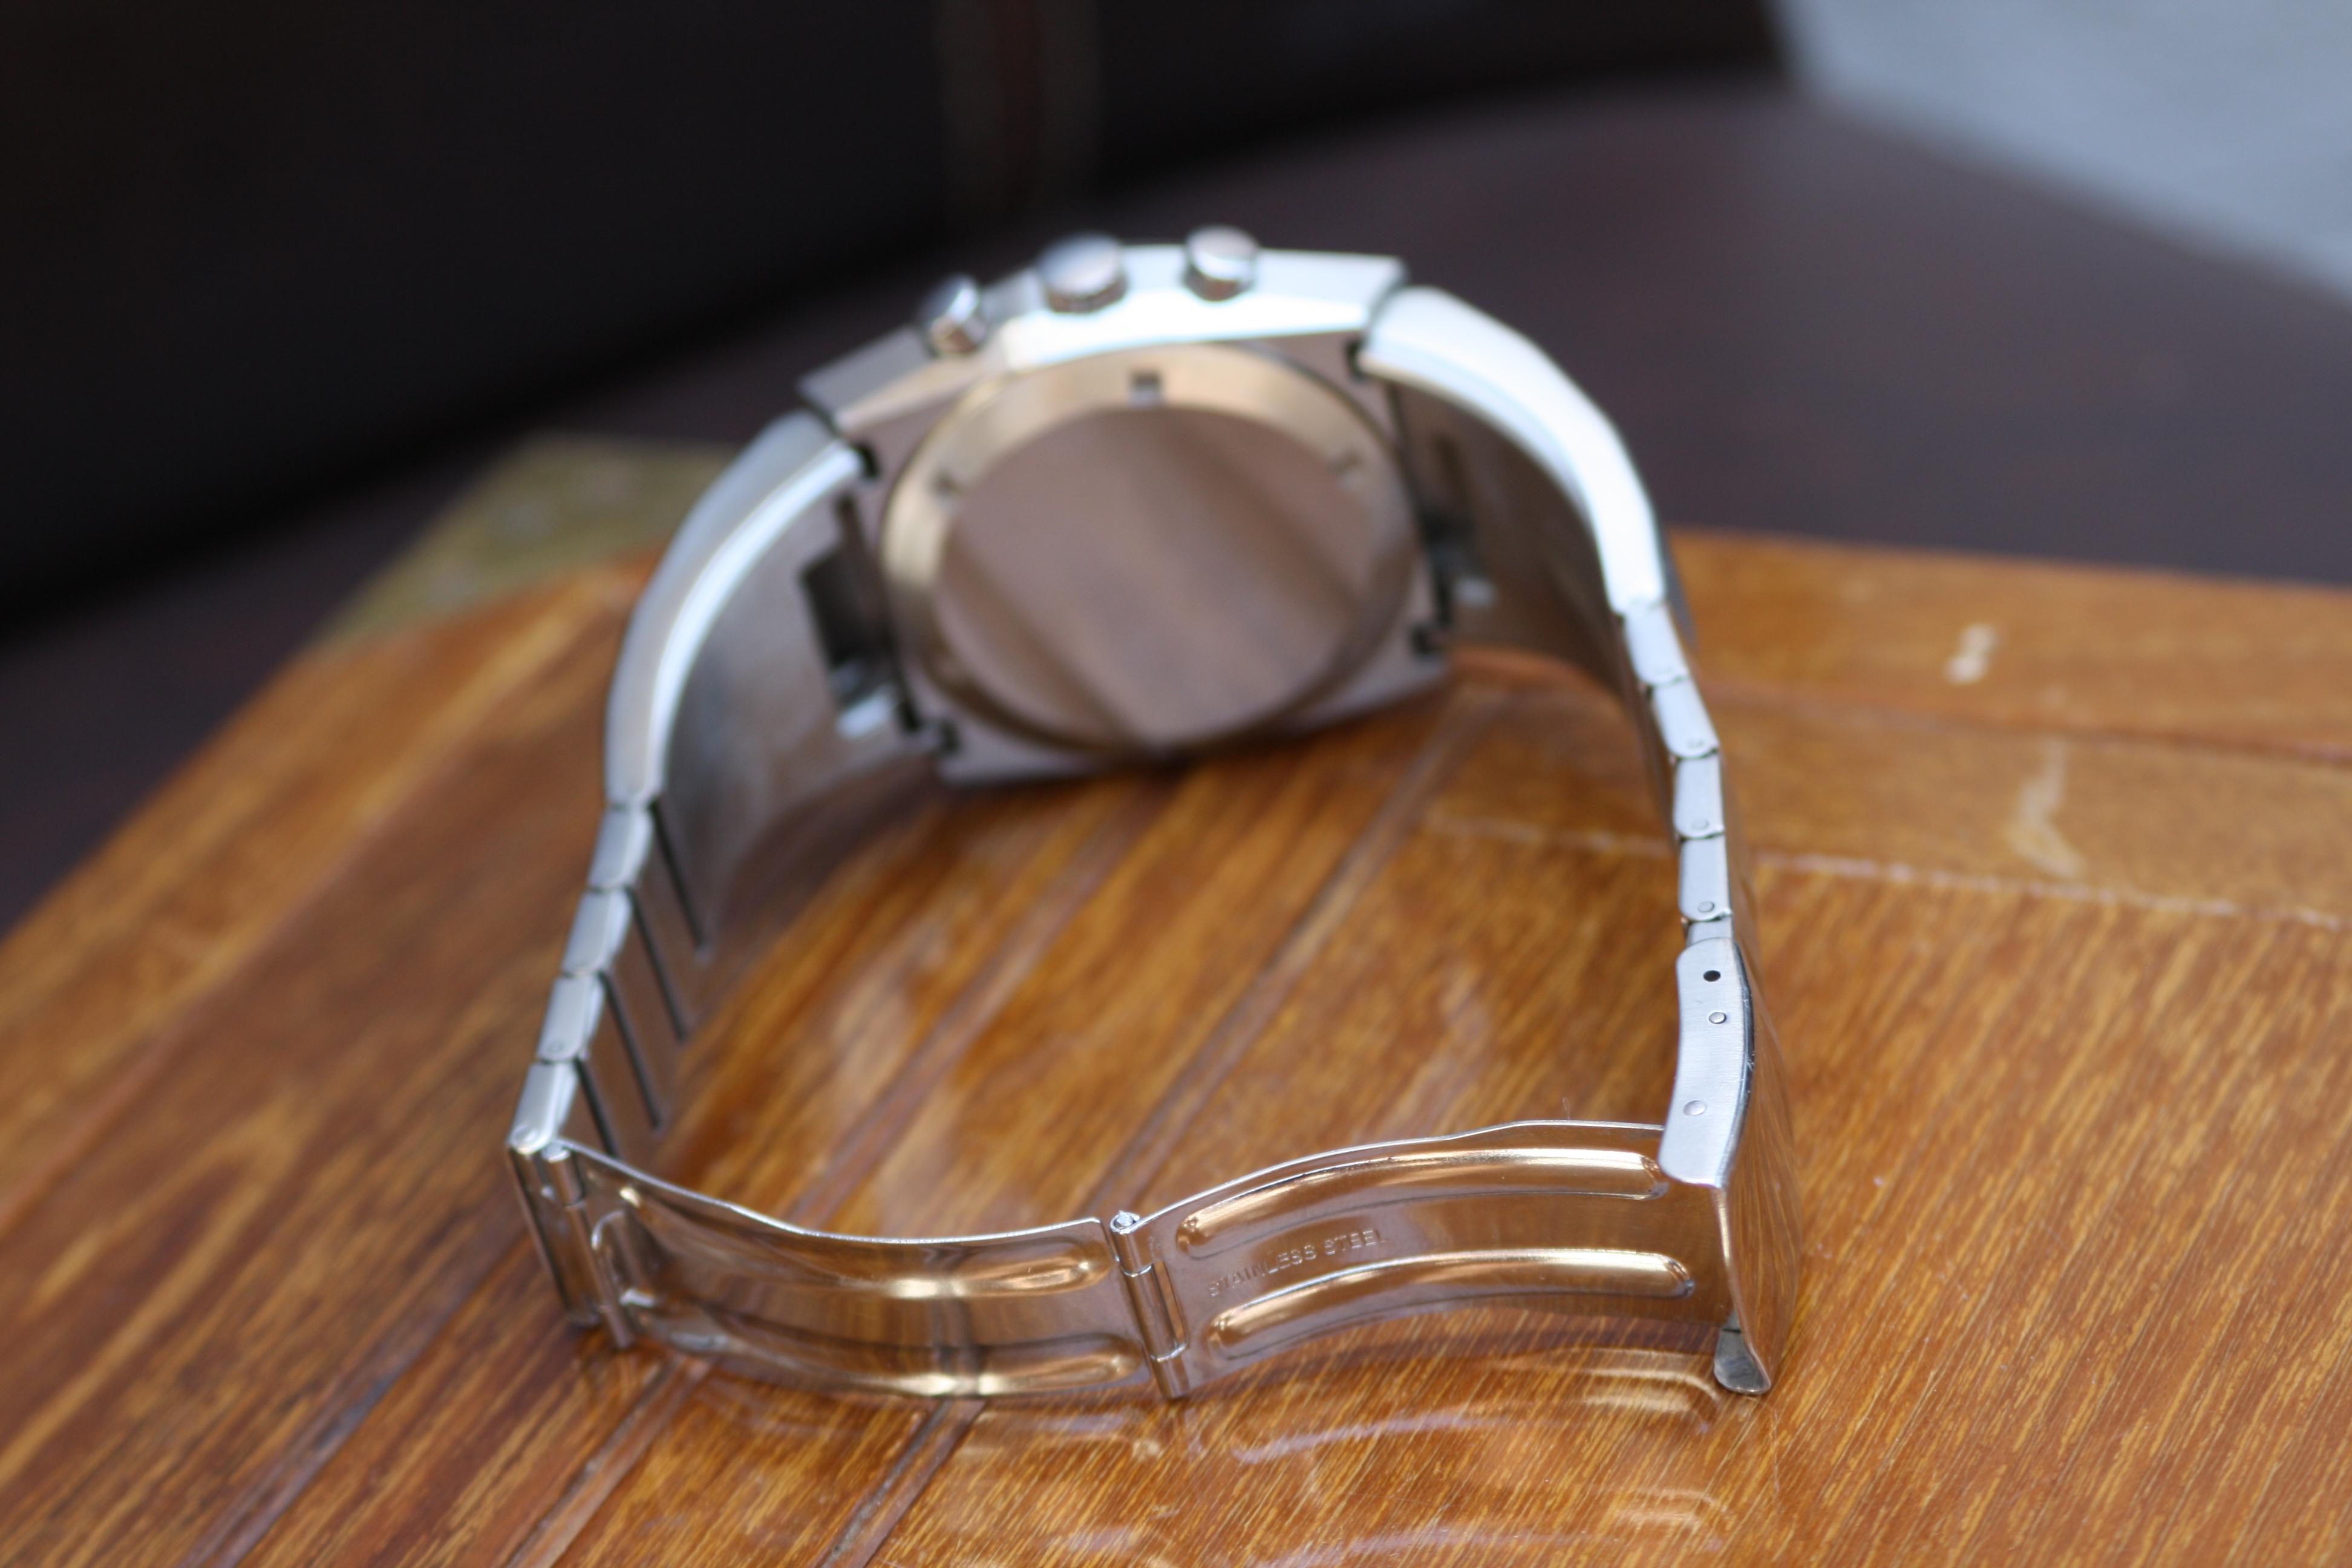 Tissot chronograaf